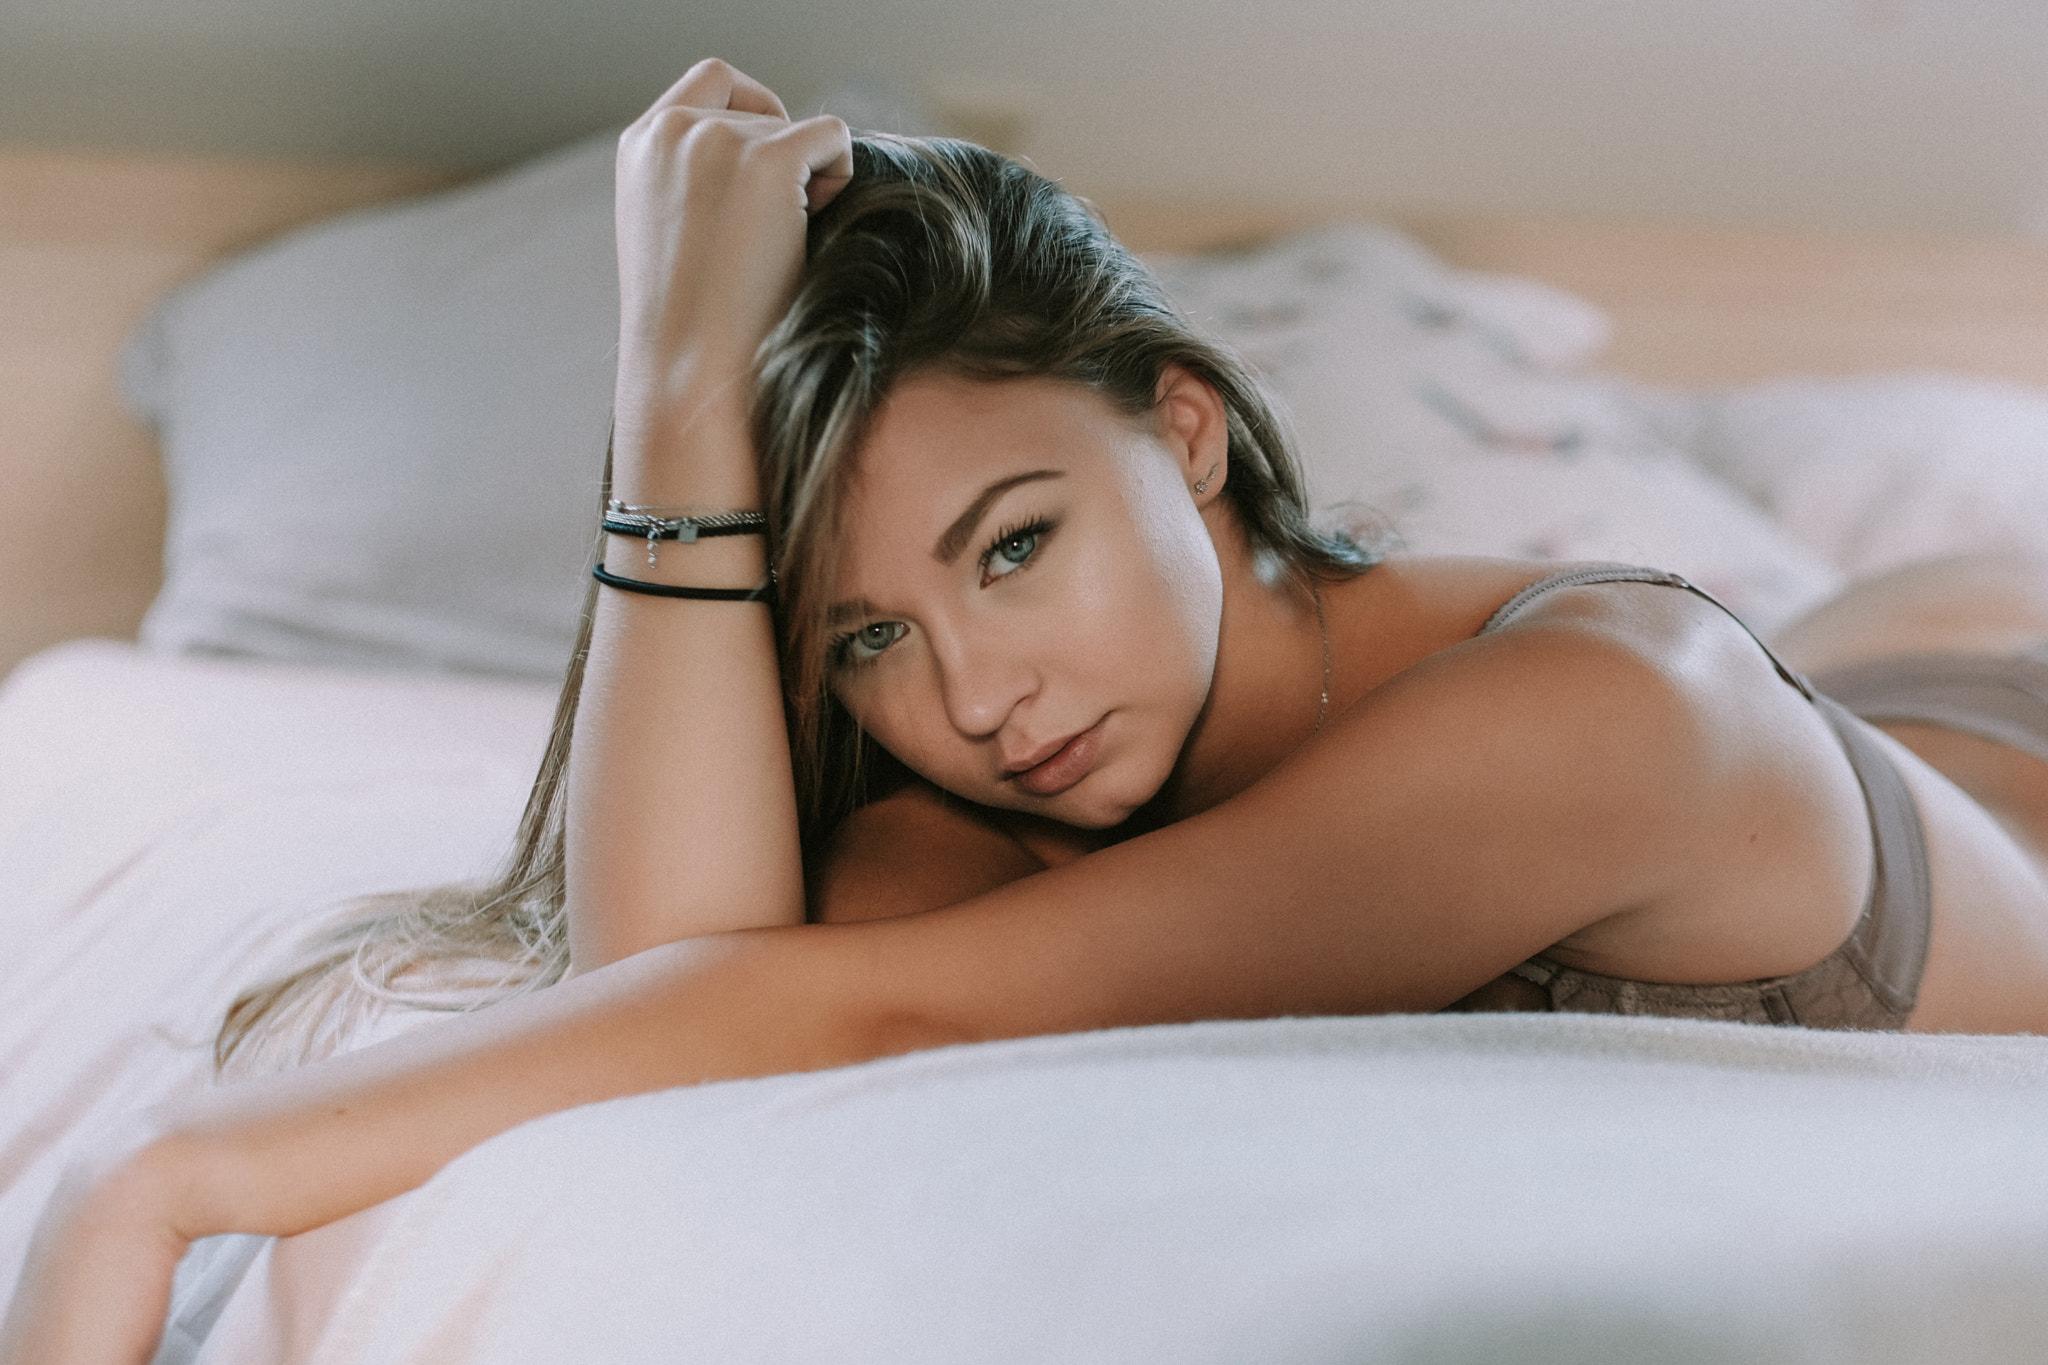 unknown erotic Asian pics